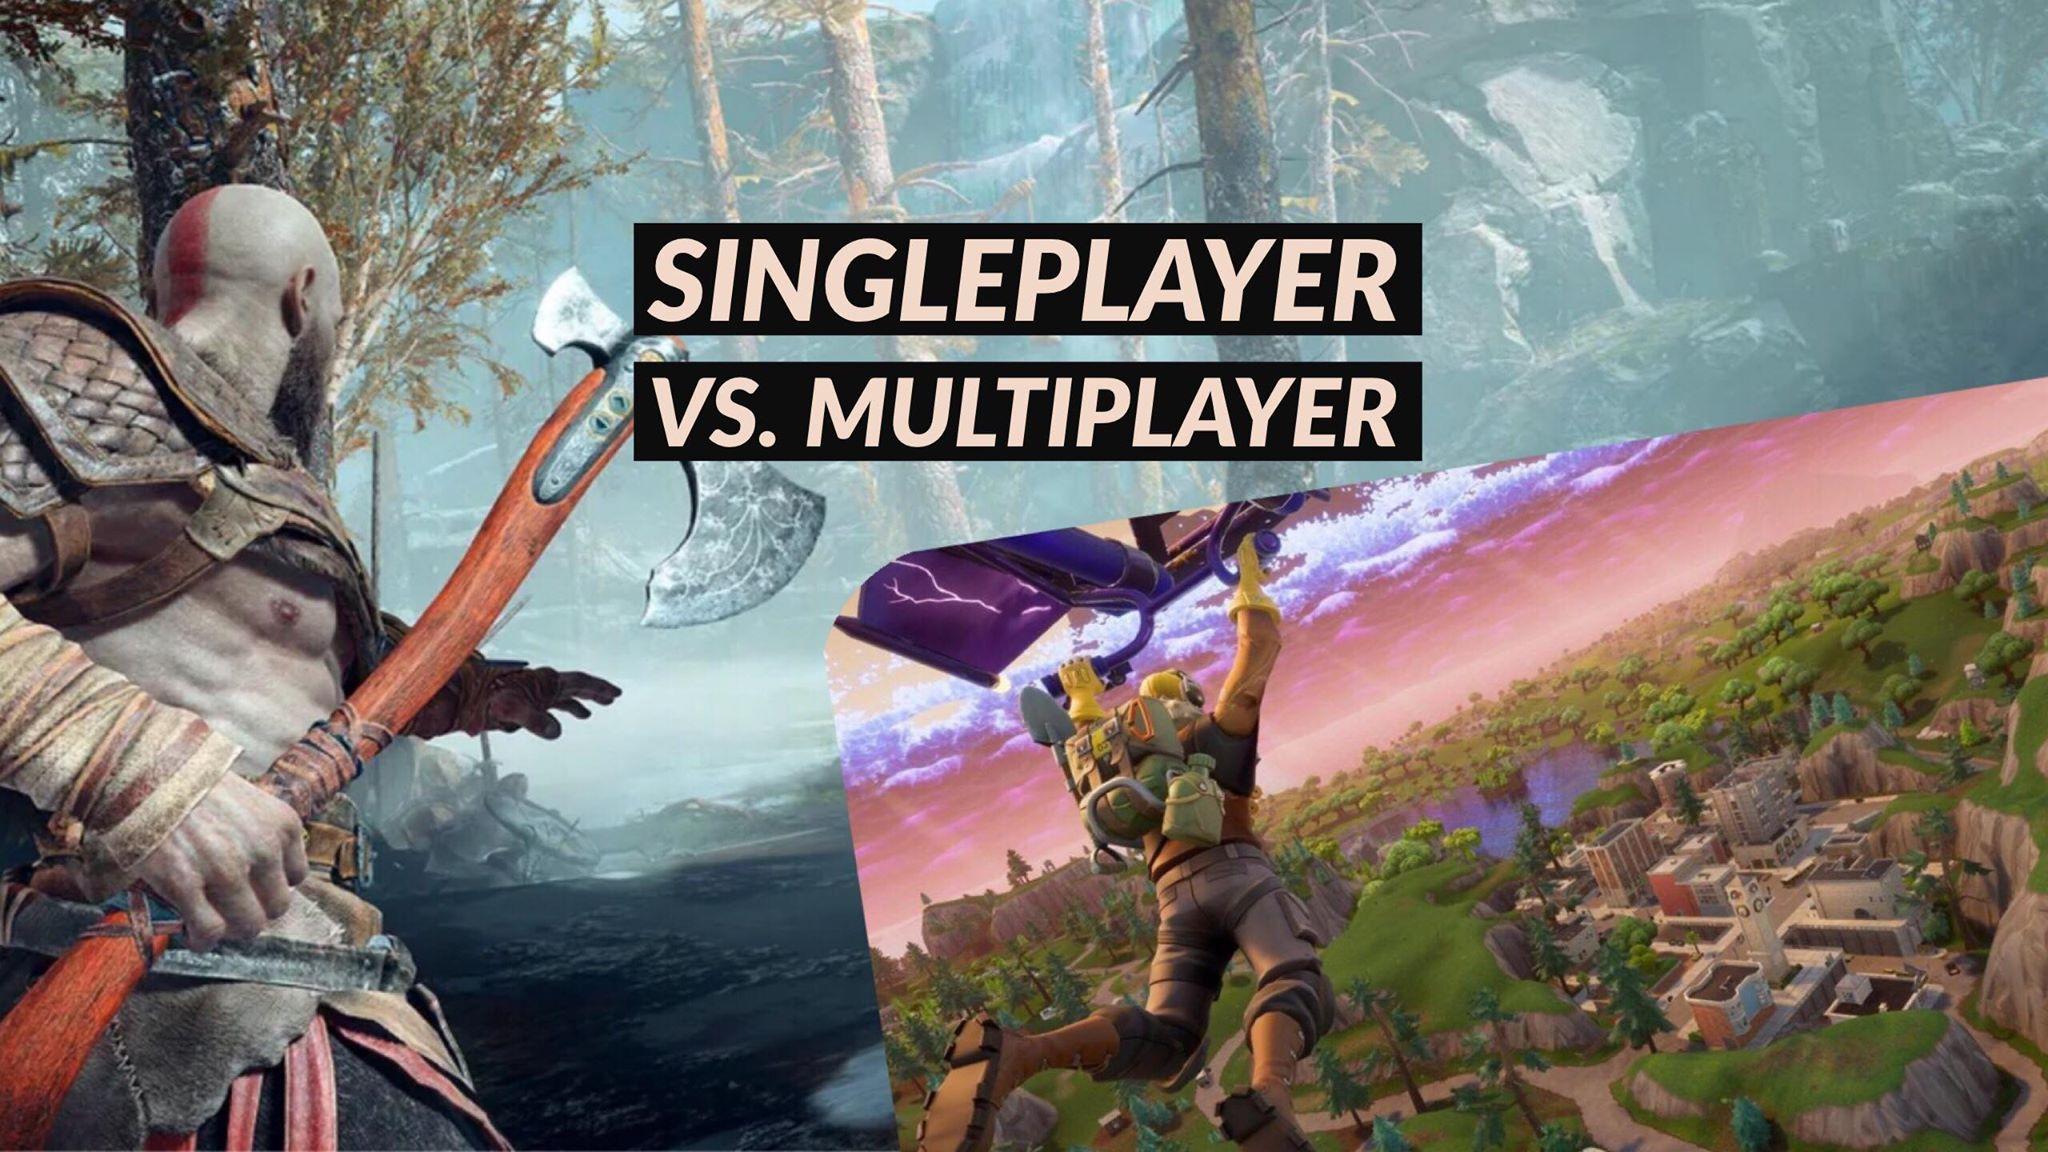 Multiplayer VS Singleplayer